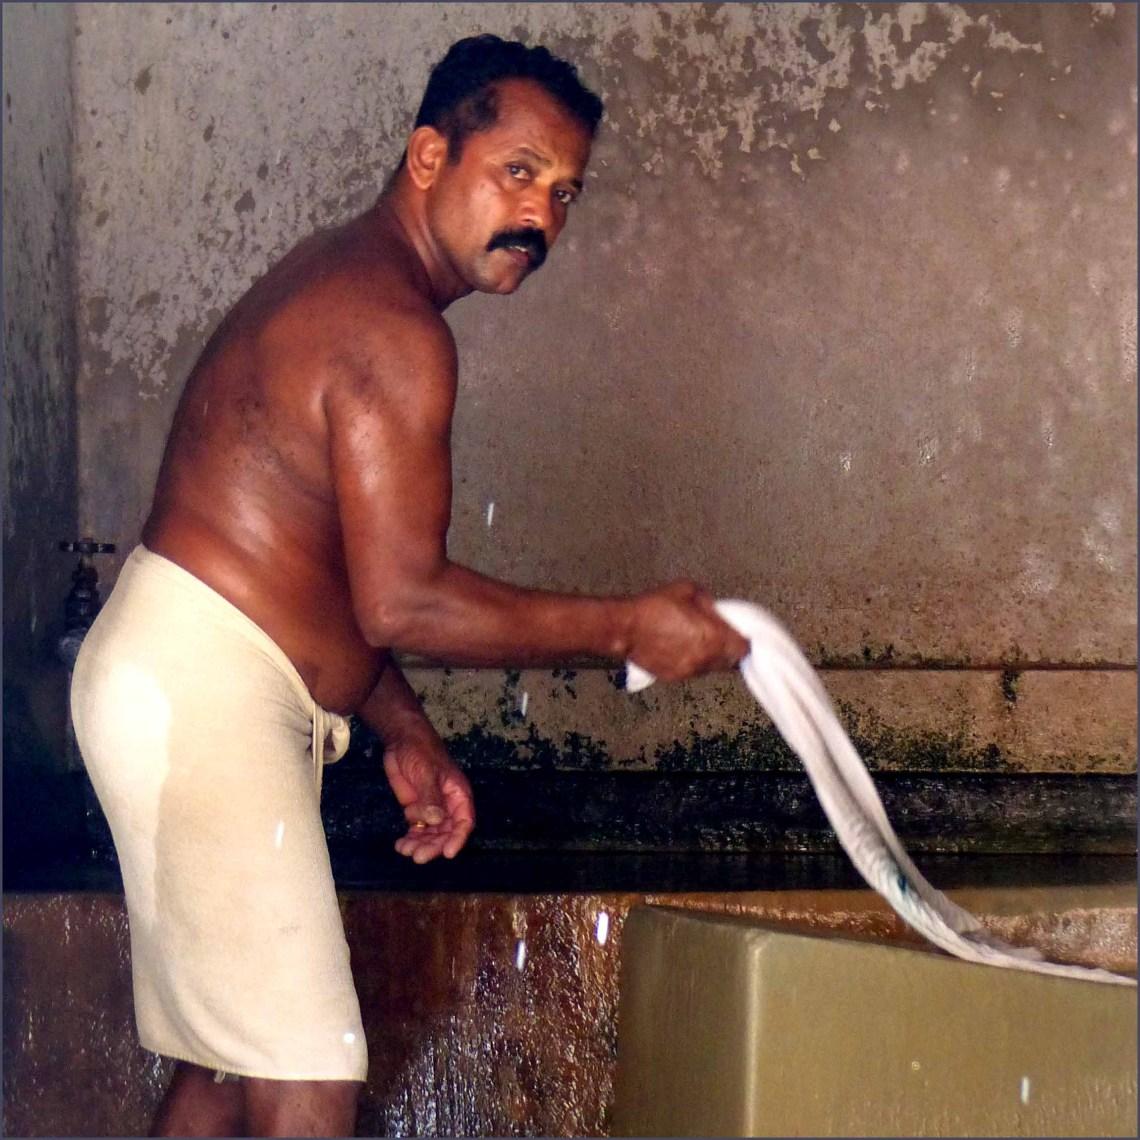 Man beating white cloth